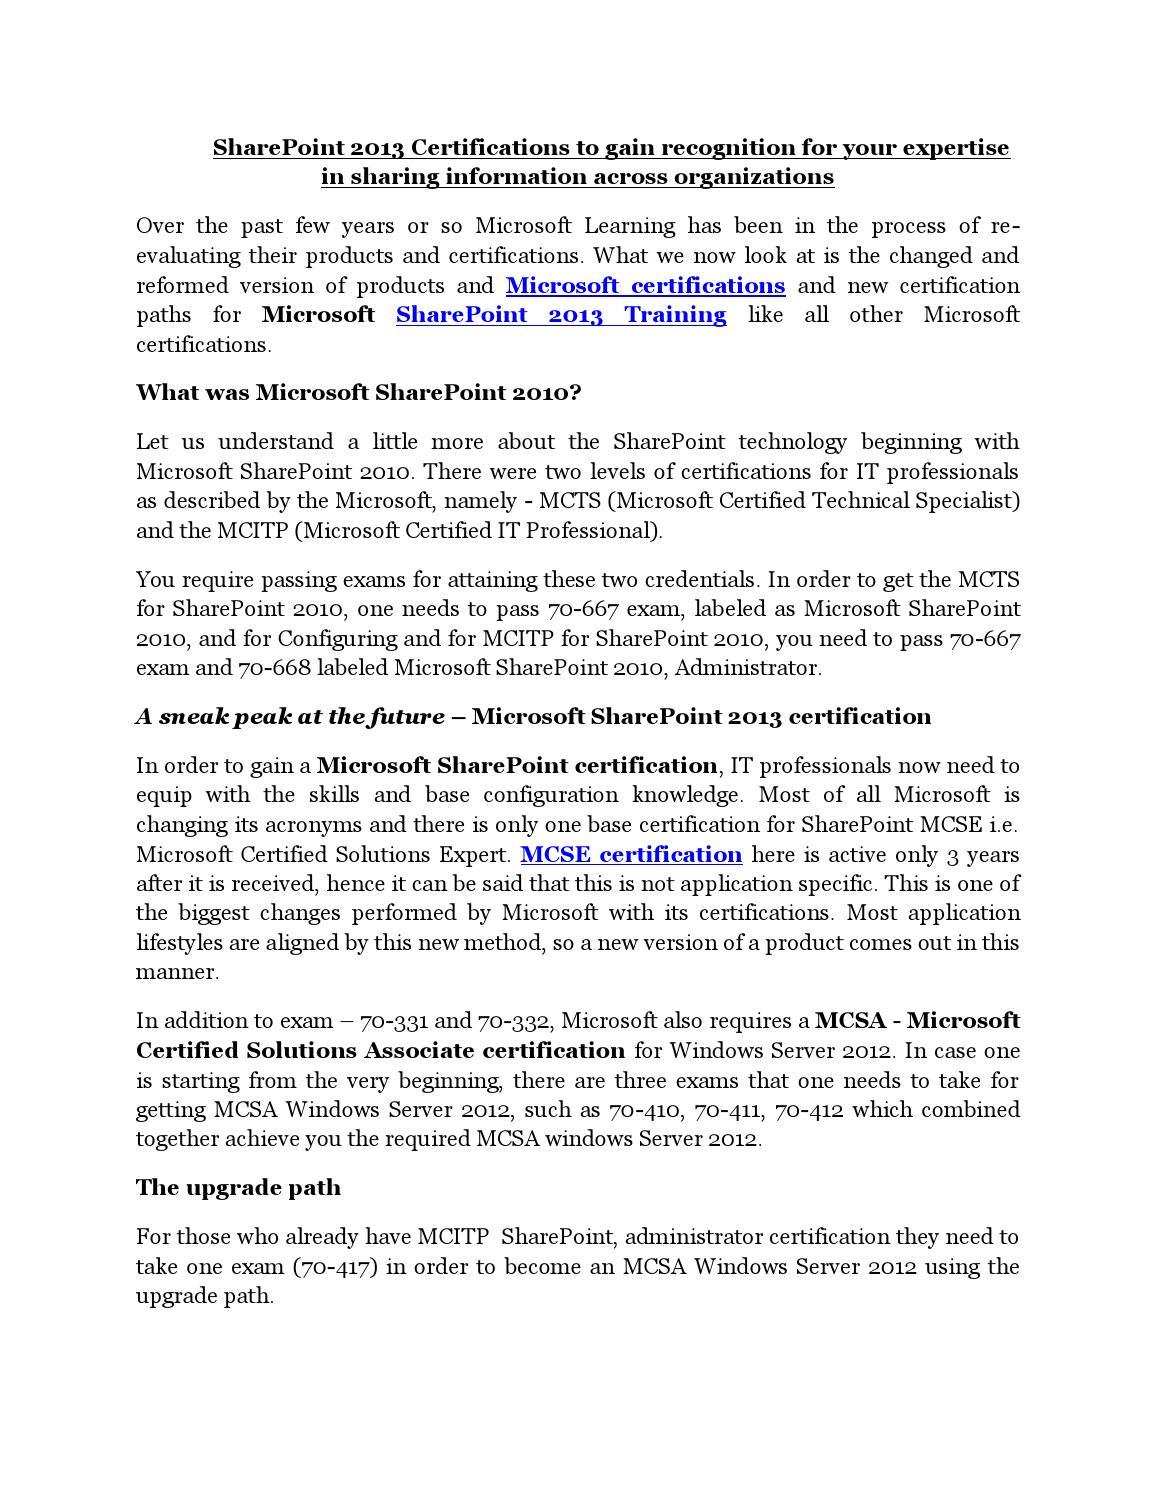 Microsoft sharepoint 2013 training and certifications pdf by microsoft sharepoint 2013 training and certifications pdf by ittraining issuu 1betcityfo Images